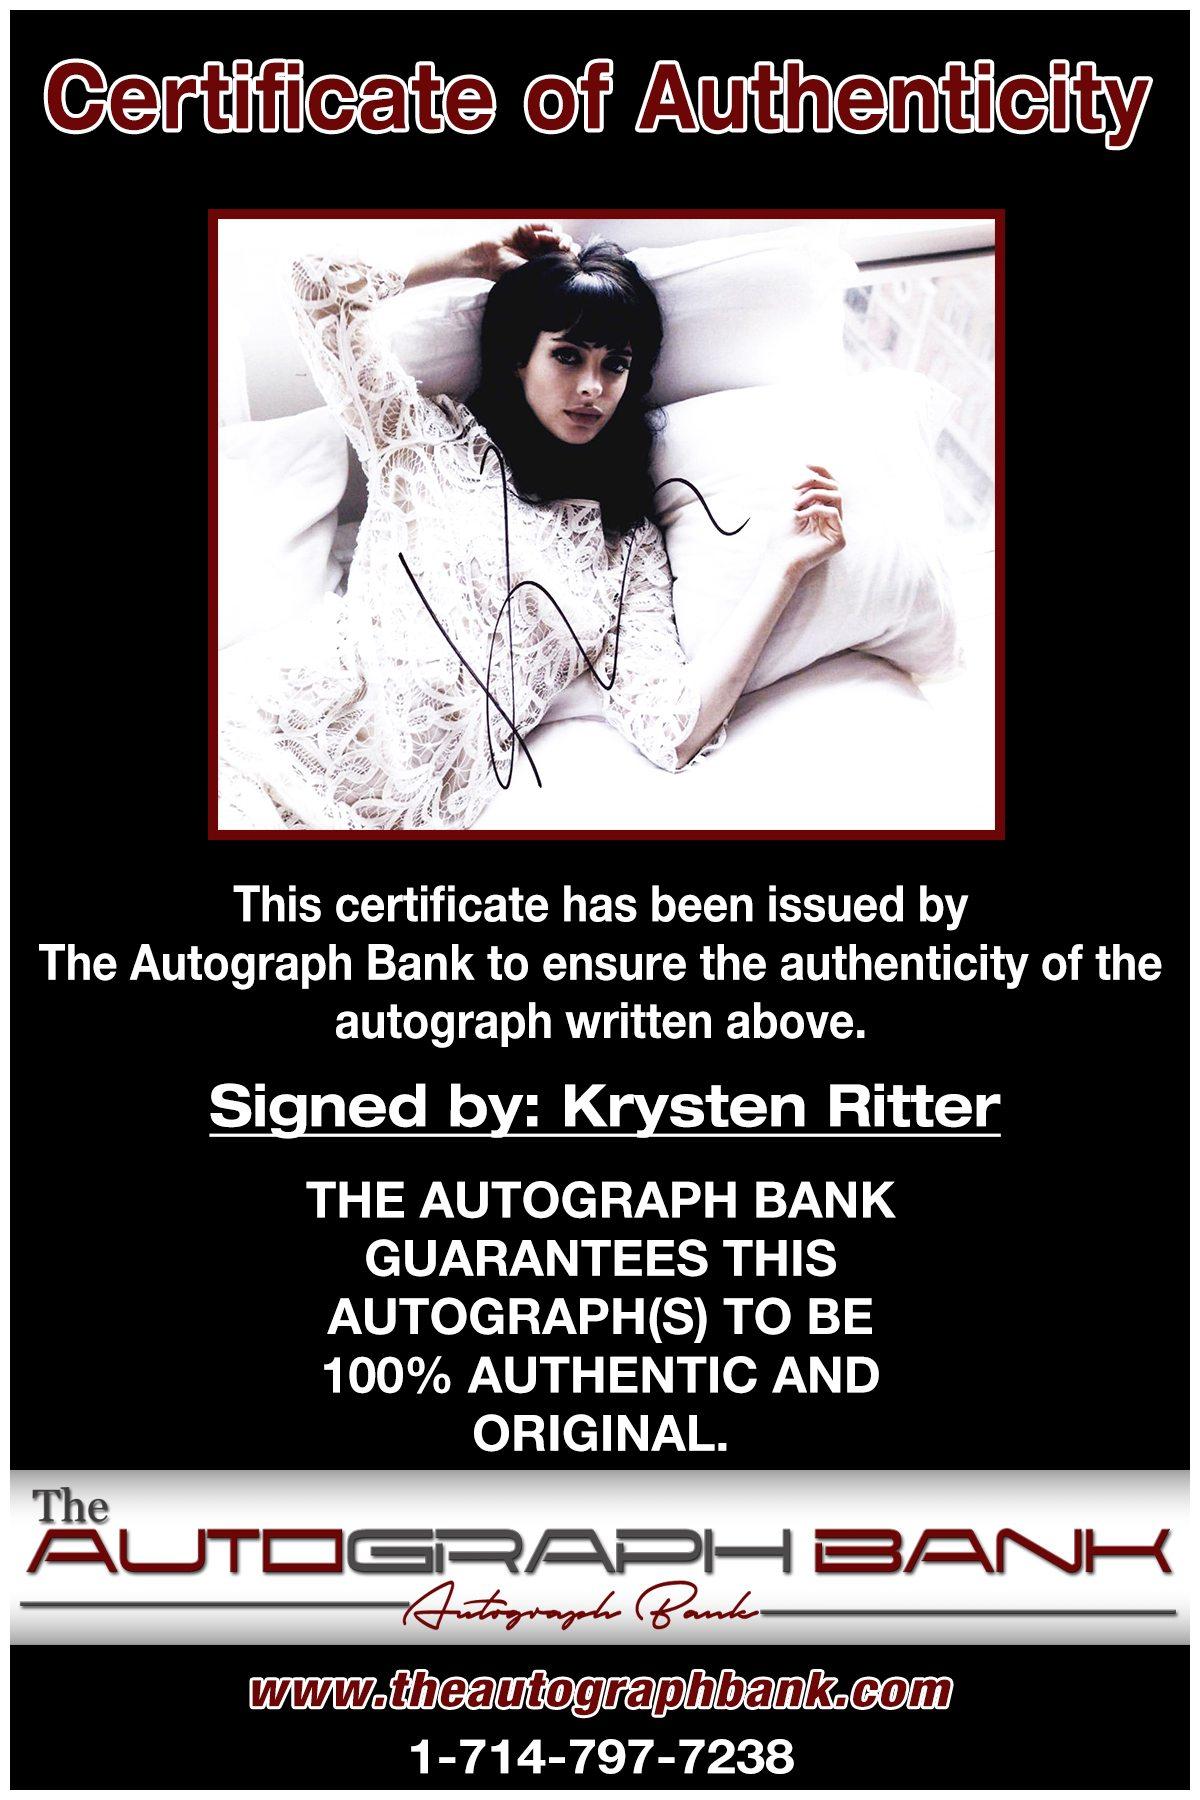 Celebrity Addresses - Mike's Autograph Website